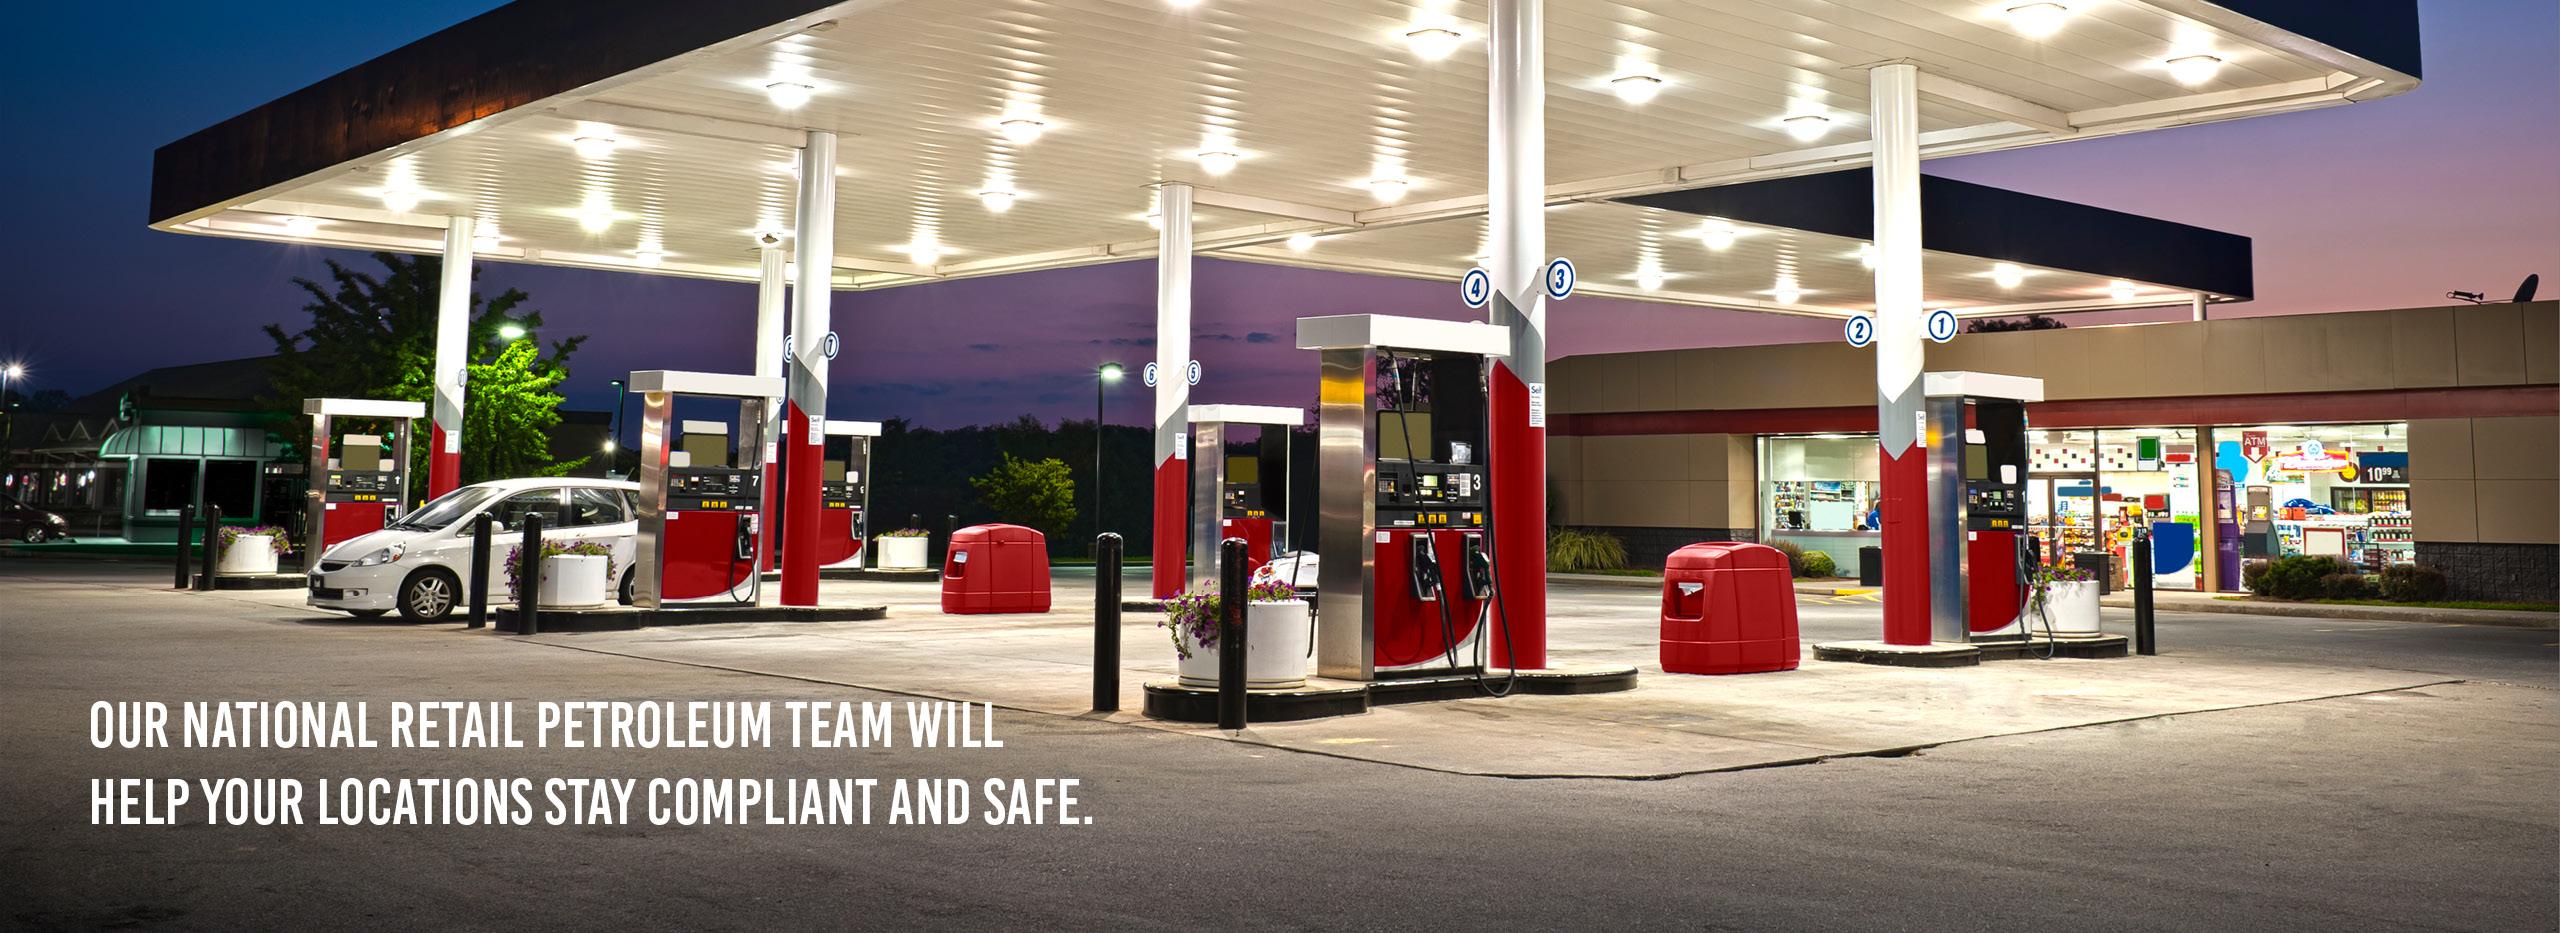 Retail Petroleum Team Will Help